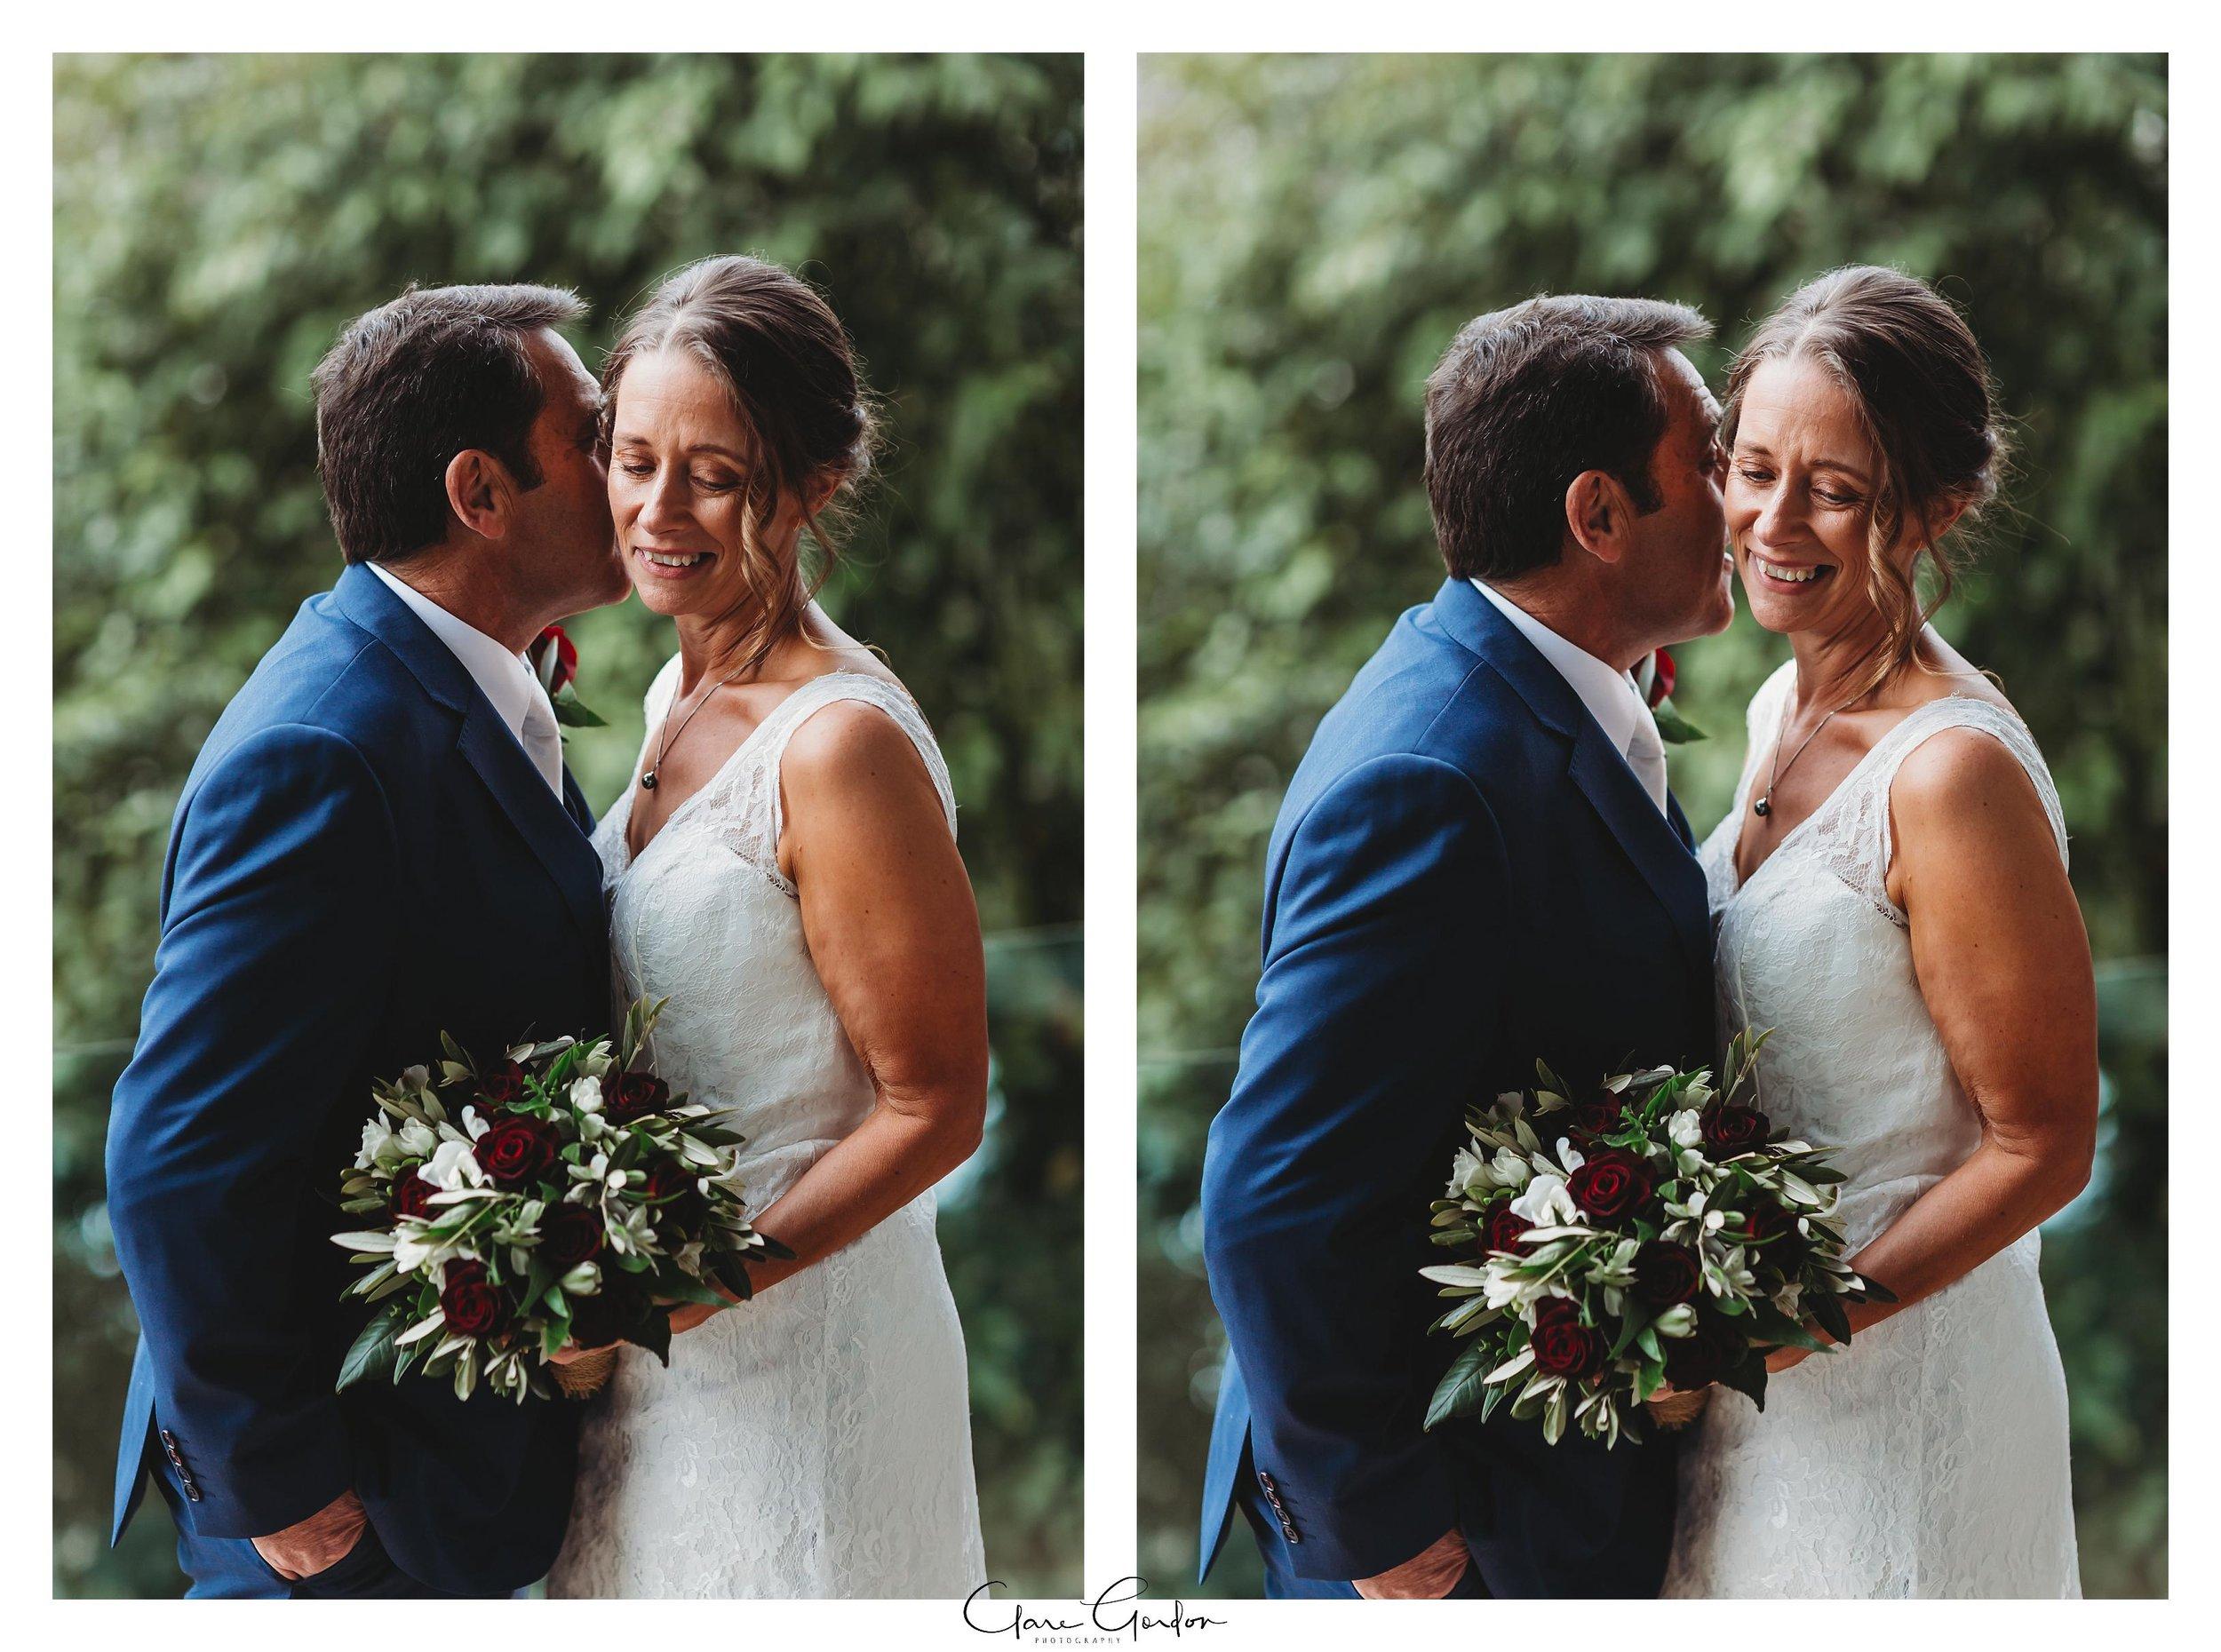 Hamilton-NZ-wedding-photographer-Bride-reflection-Waikato-wedding-photographer-Novotel-Hamilton-Clare-Gordon-photography (21).jpg